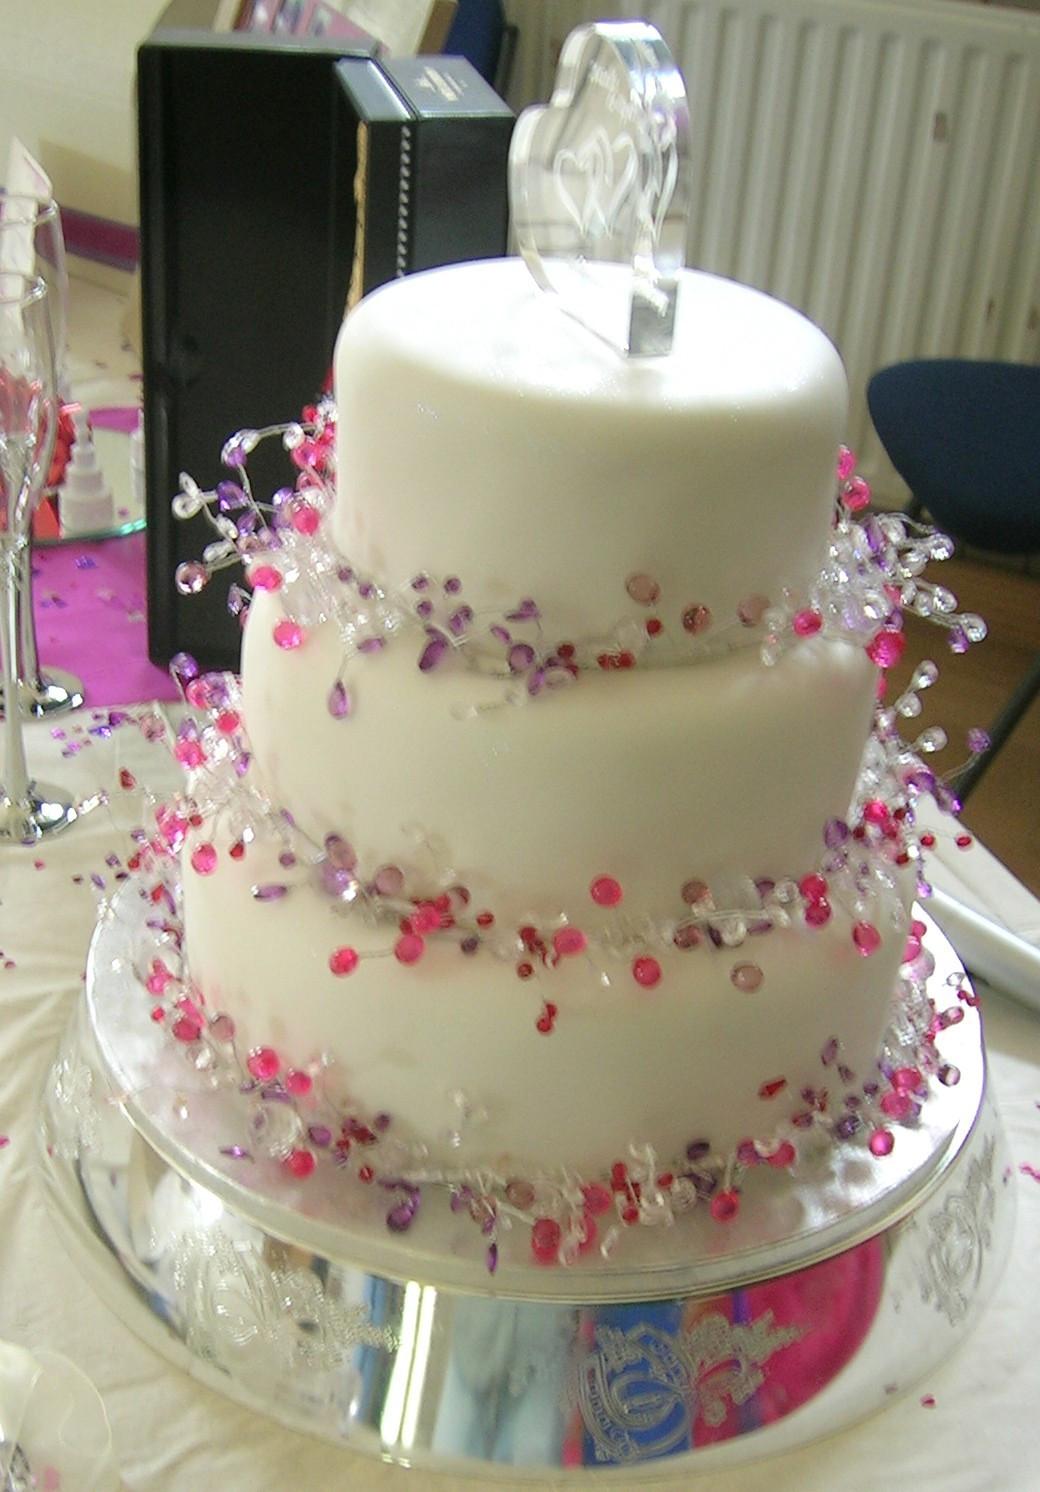 Making Wedding Cakes Beginners  Cake Decorating